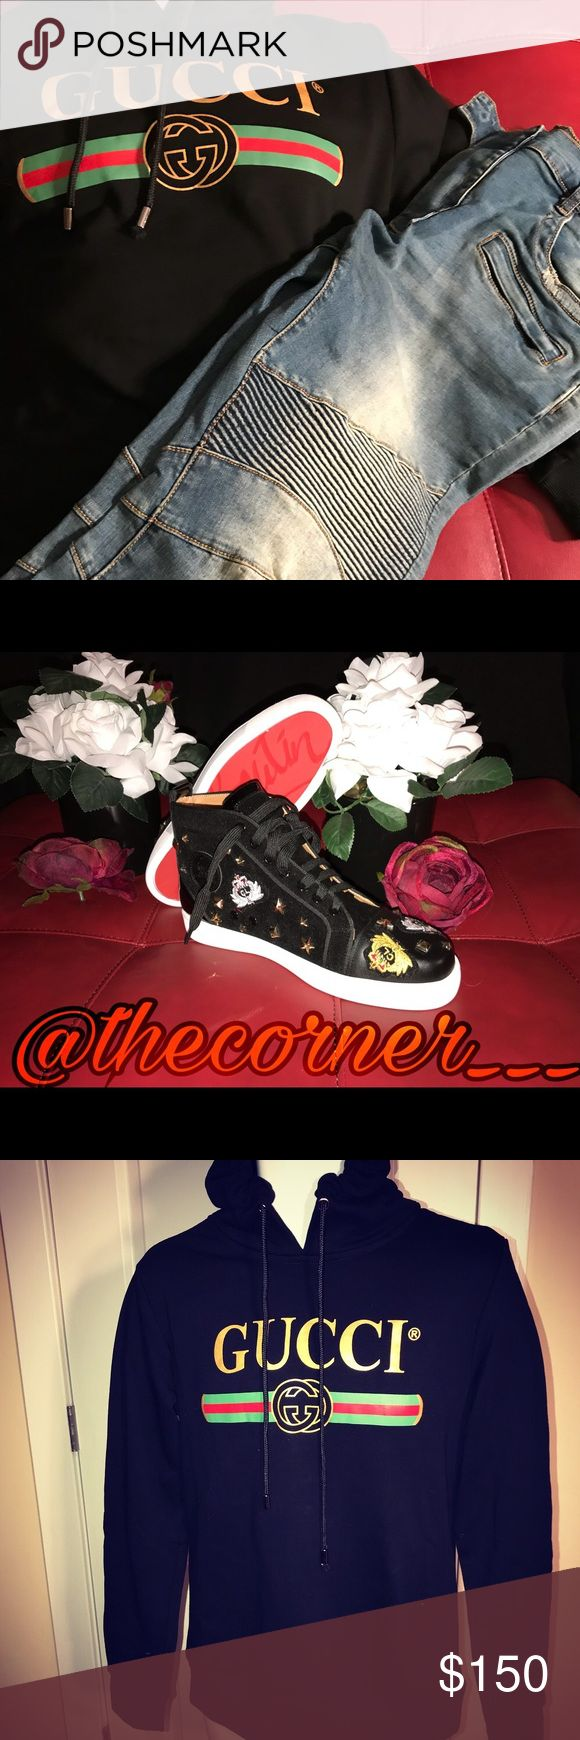 Gucci, Balmain, & Lou Boutin IG: @thecorner___ *Gucci Hoodie *Balmain Jeans *Lou Boutin Red Bottoms Gucci Other